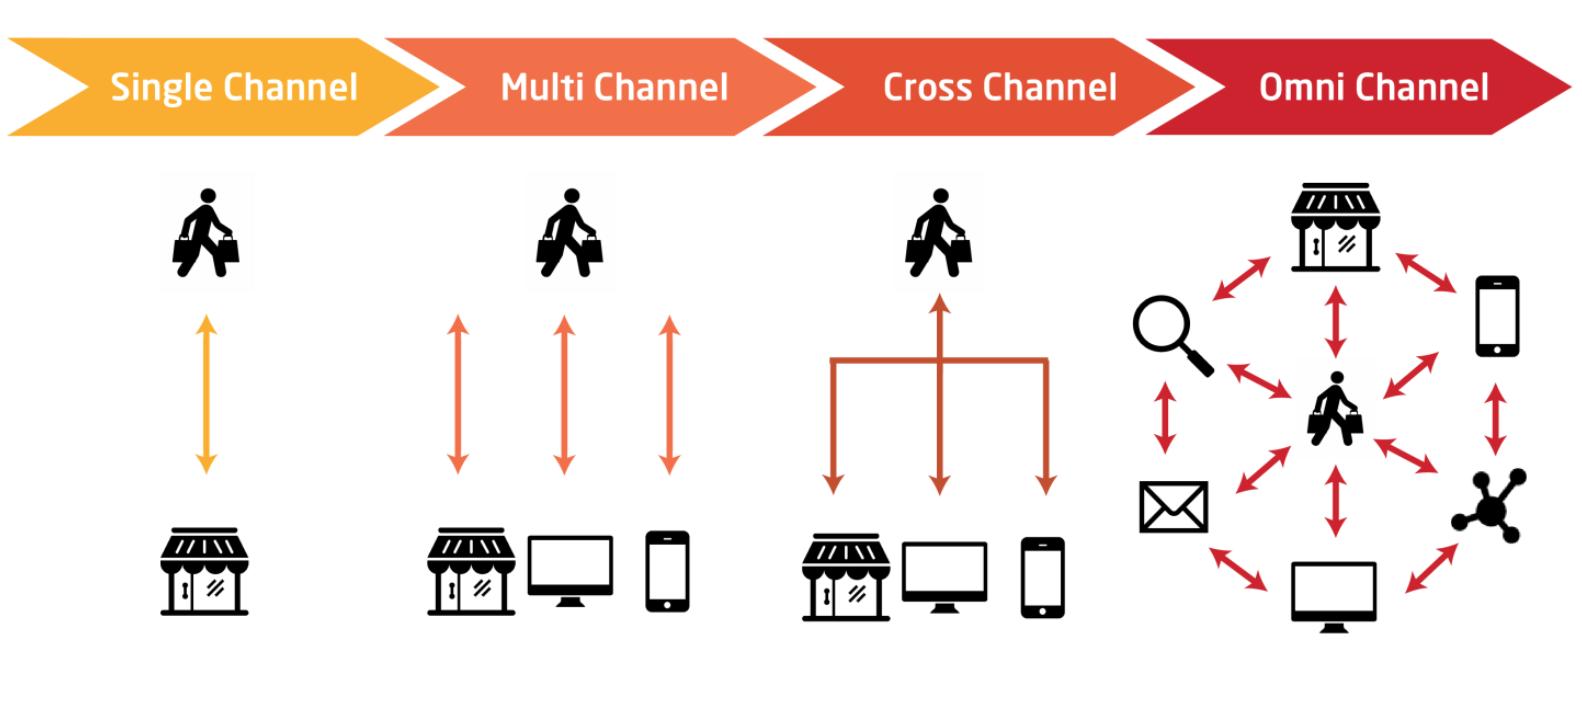 Inevitable Digital Transformation - Cross Channel